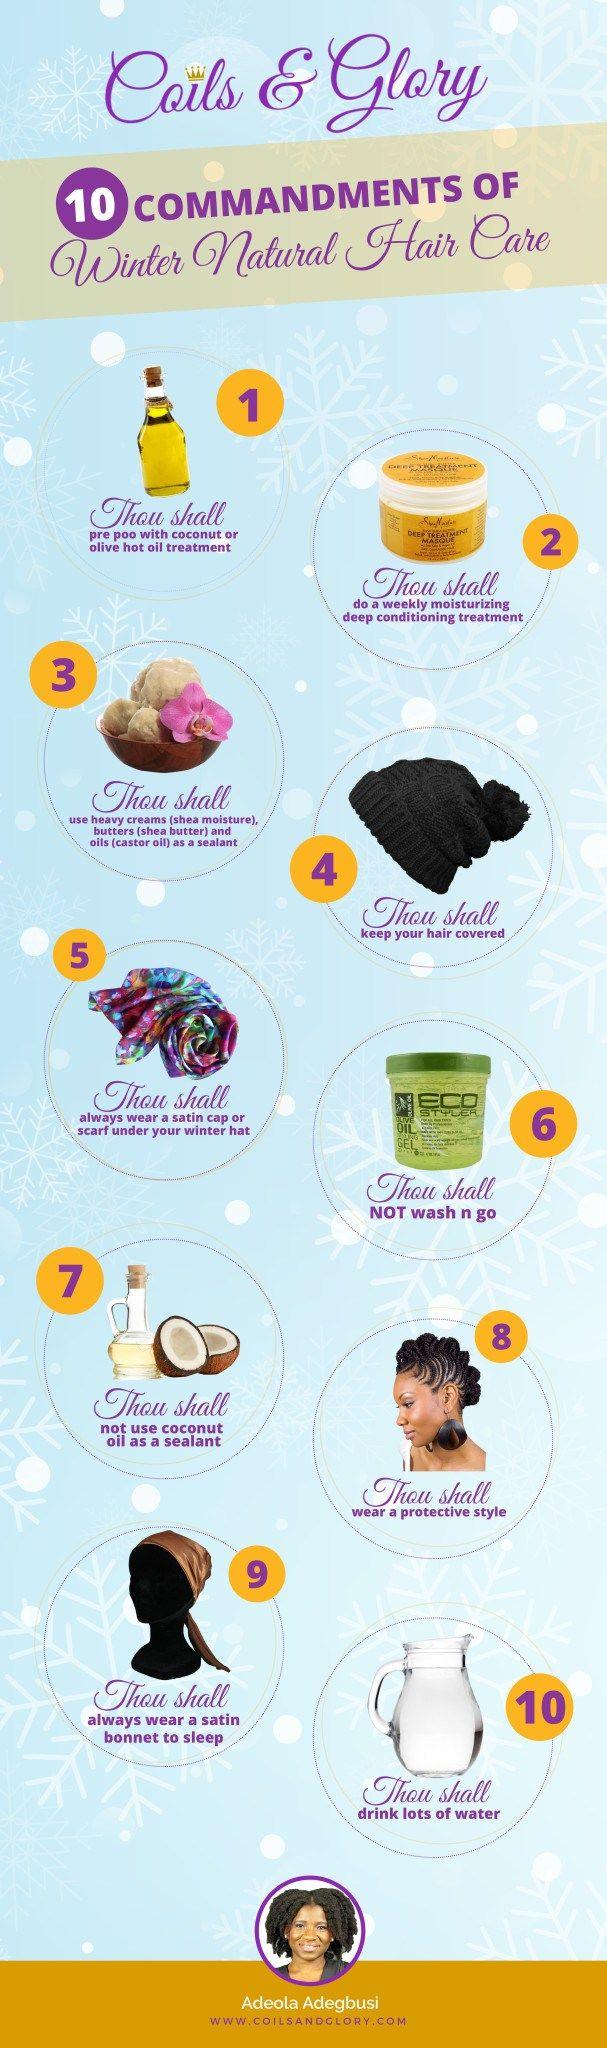 Natural Hair Commandments For Winter Hair Care Winter Natural Hair Care Winter Natural Hairstyles Winter Hair Care